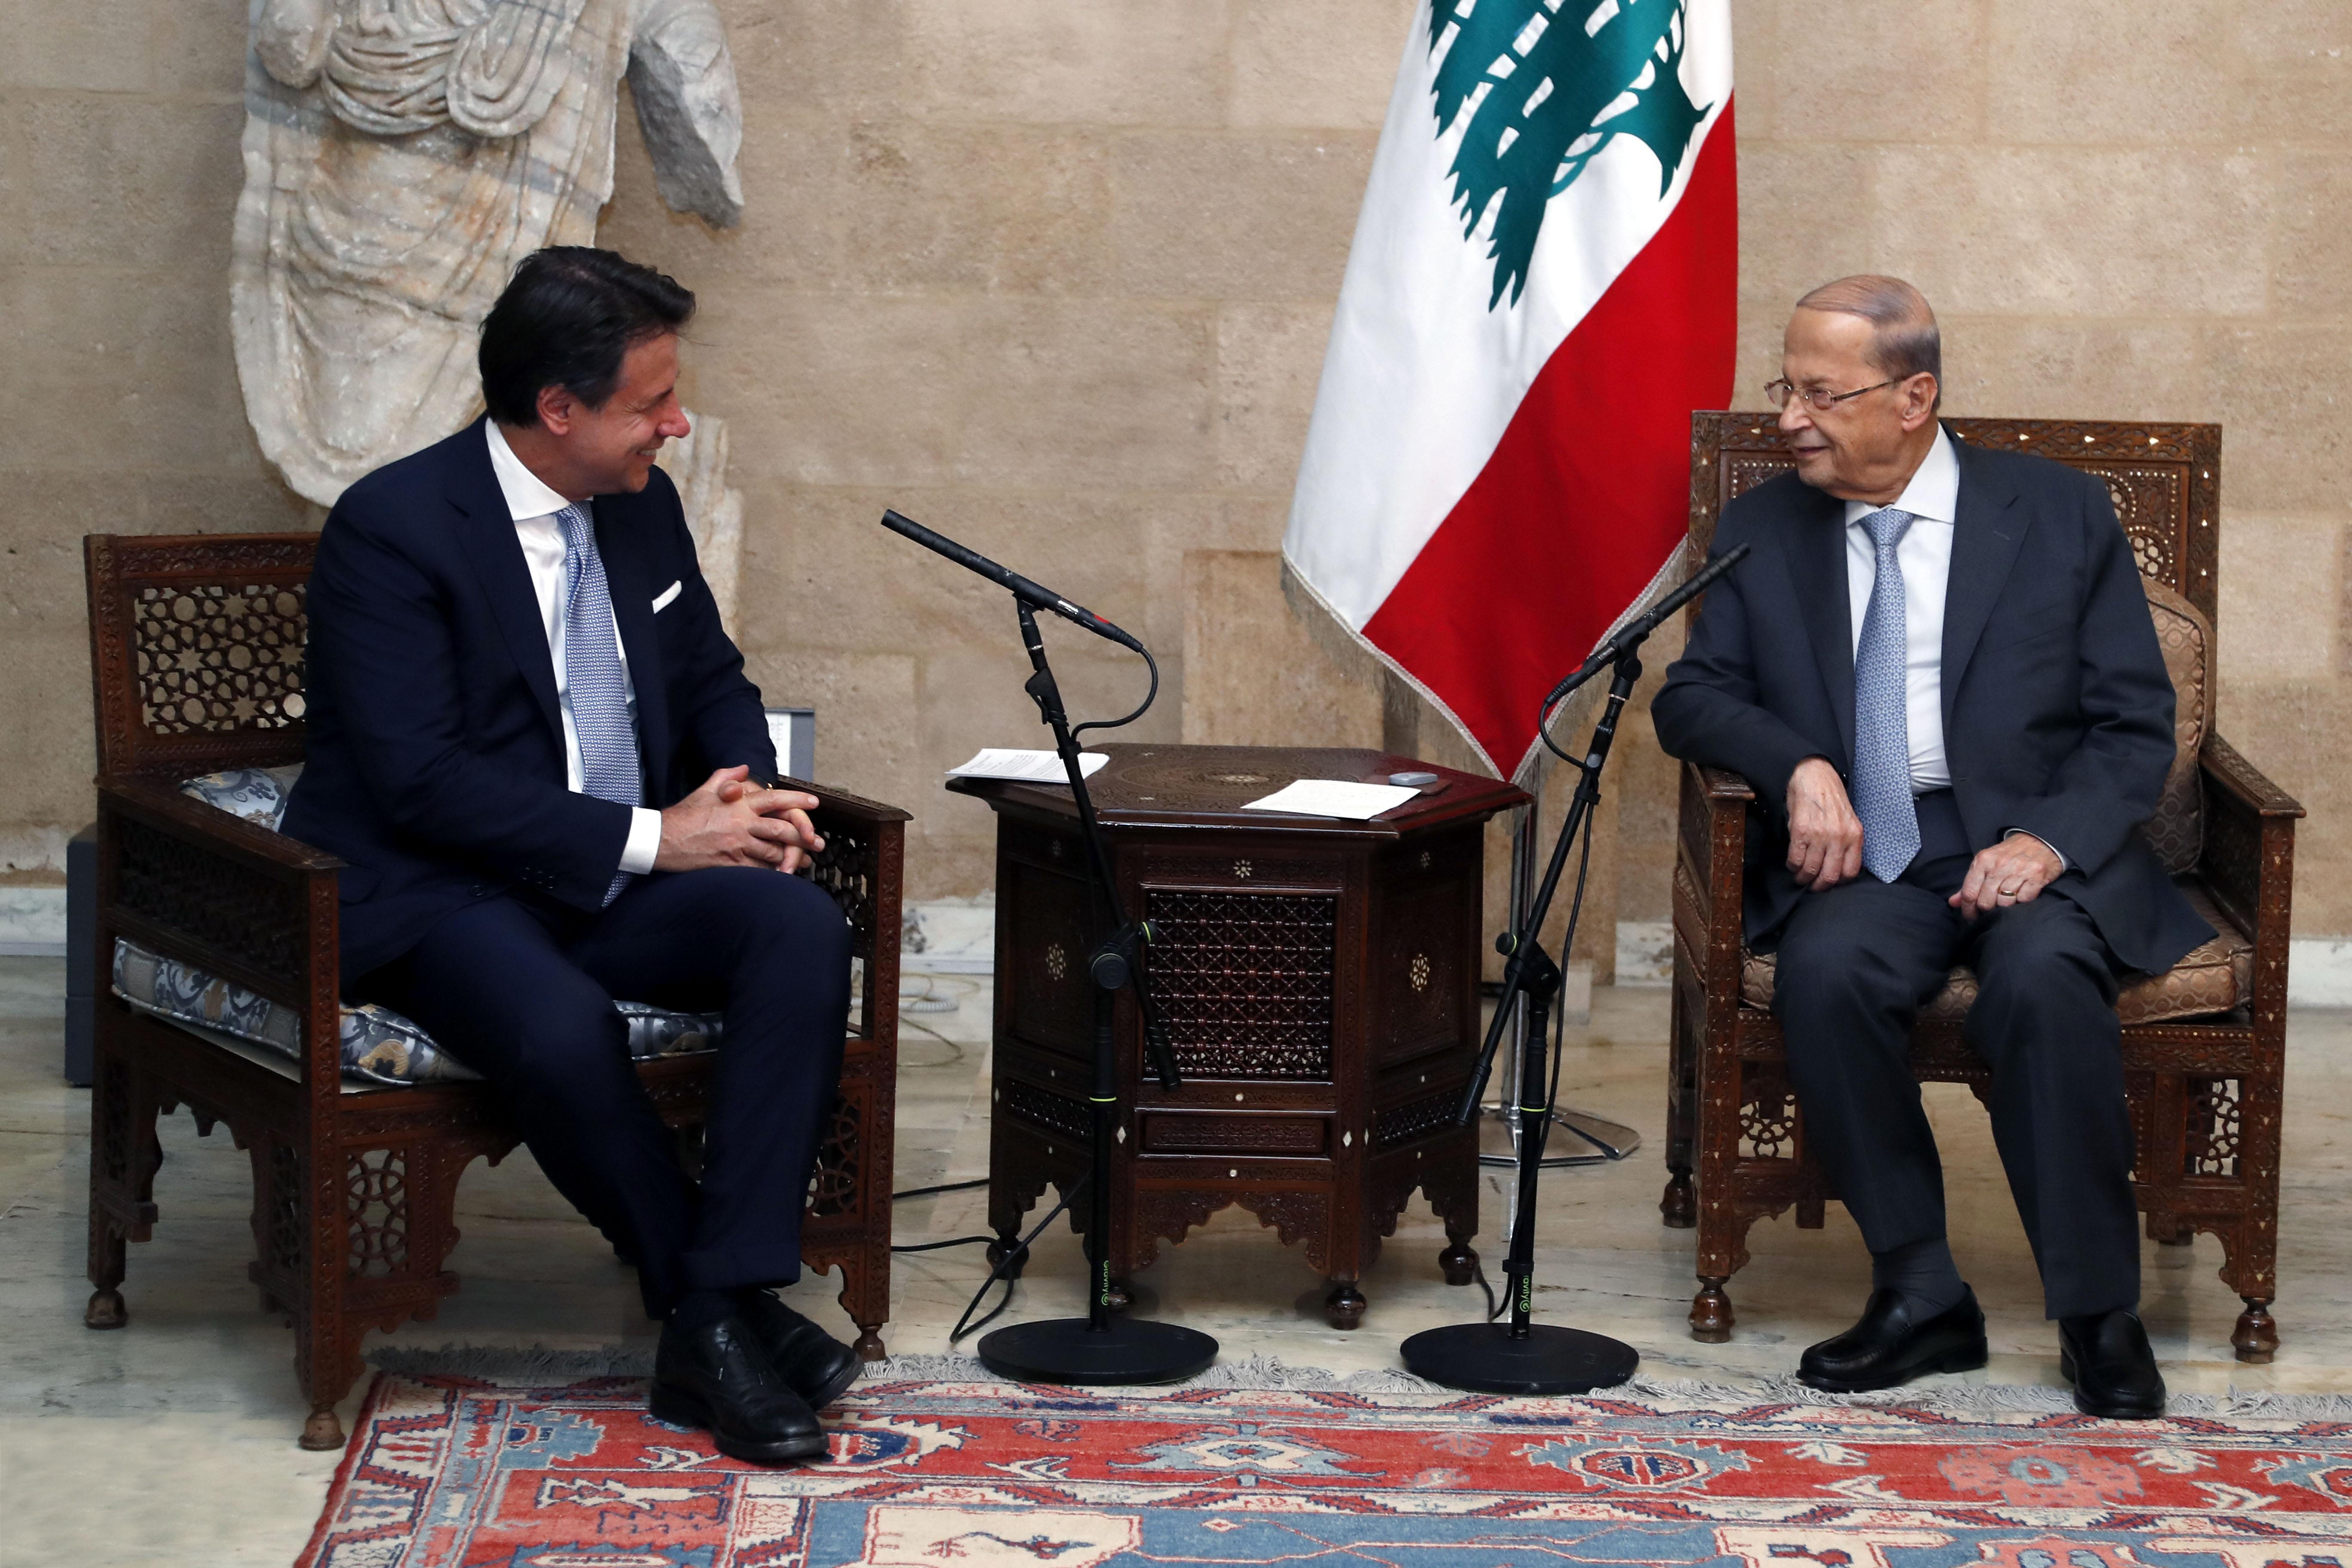 2 -  Italian Prime Minister S.E. Giuseppe Conte